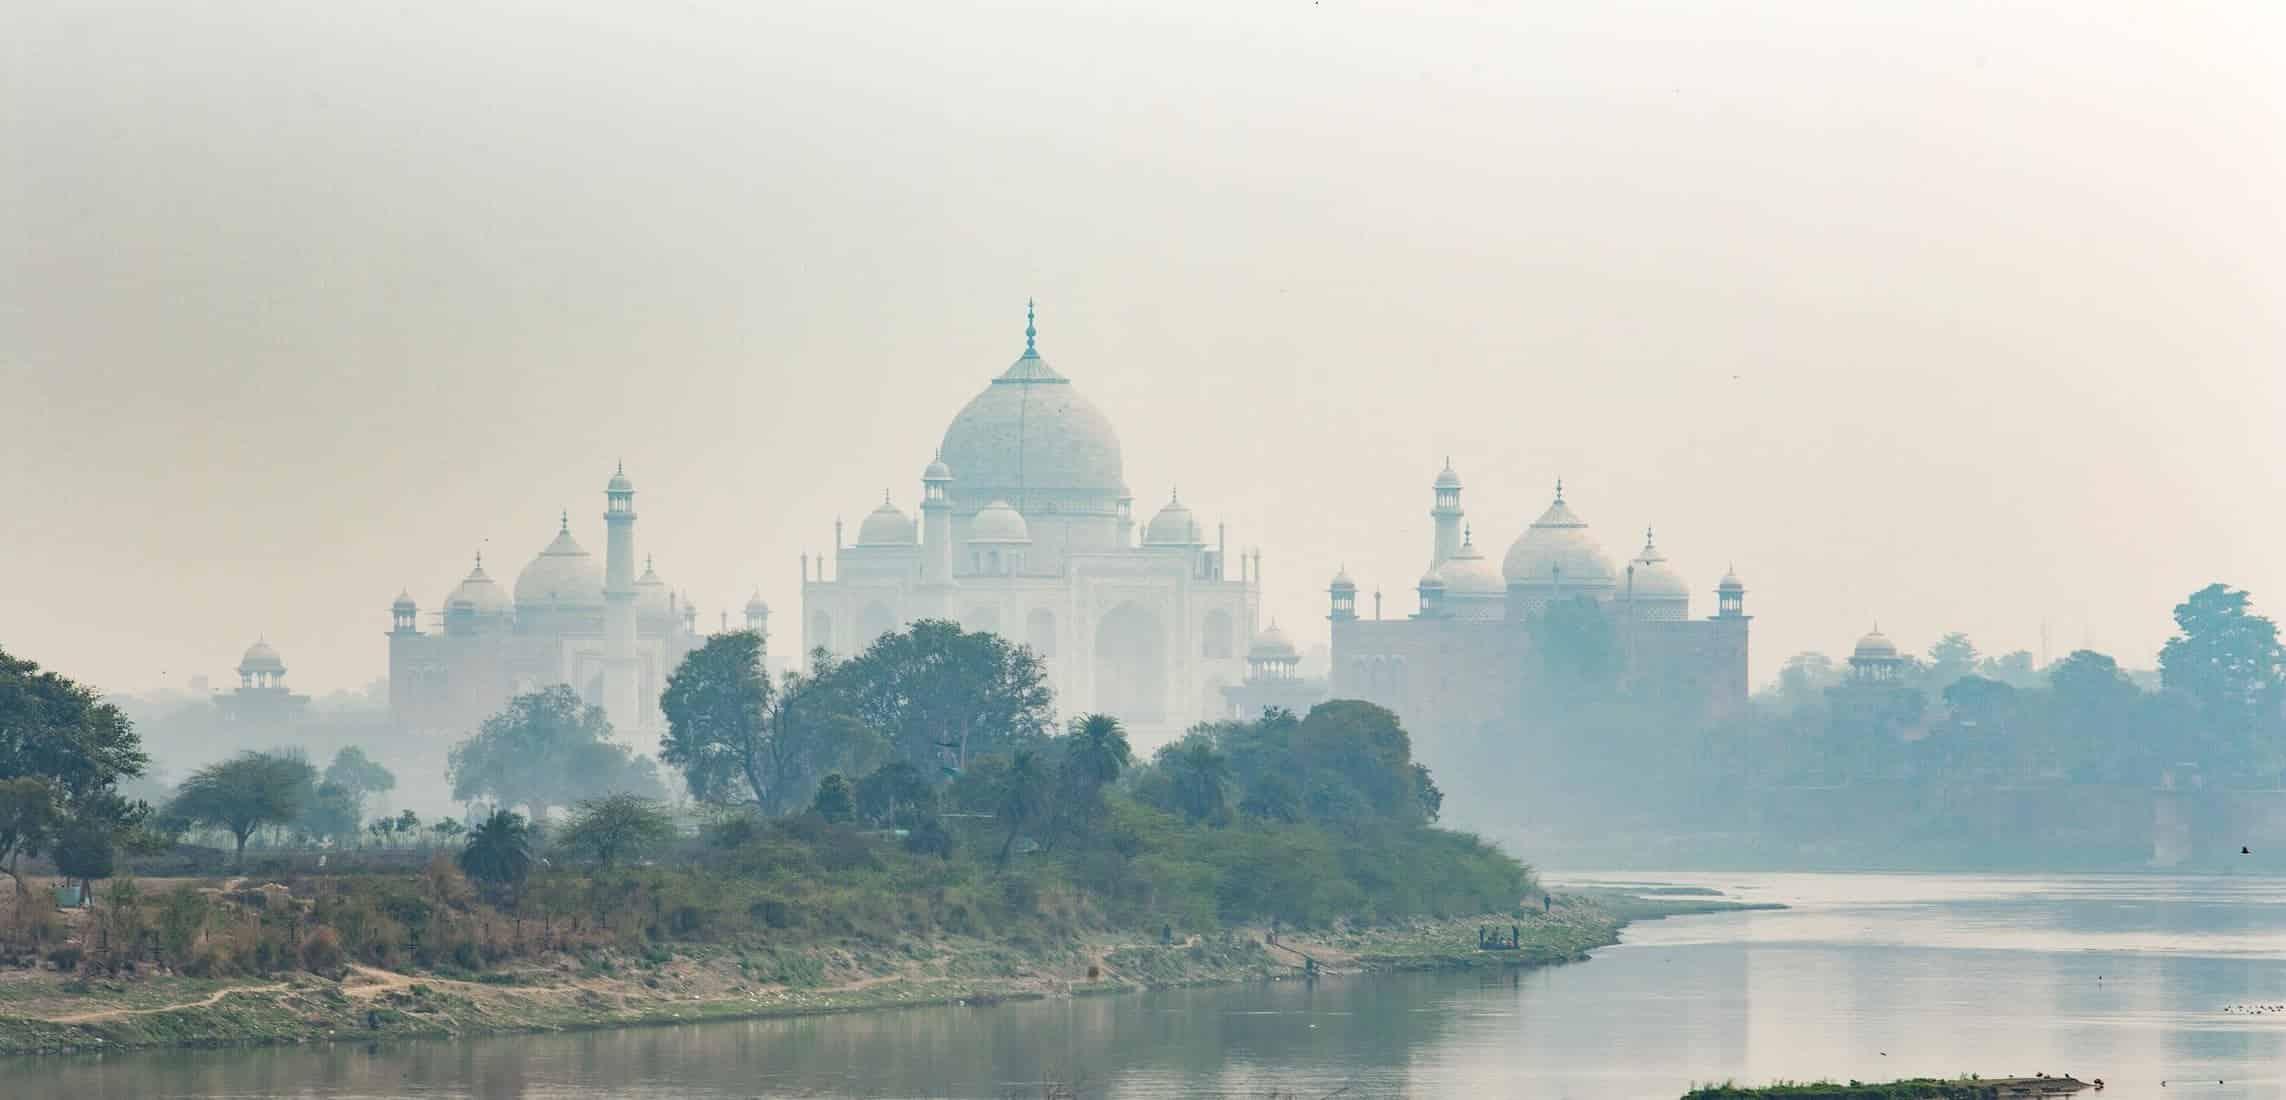 Agra, Taj Mahal, Landmark, architecture, INDIA, indian, river, february